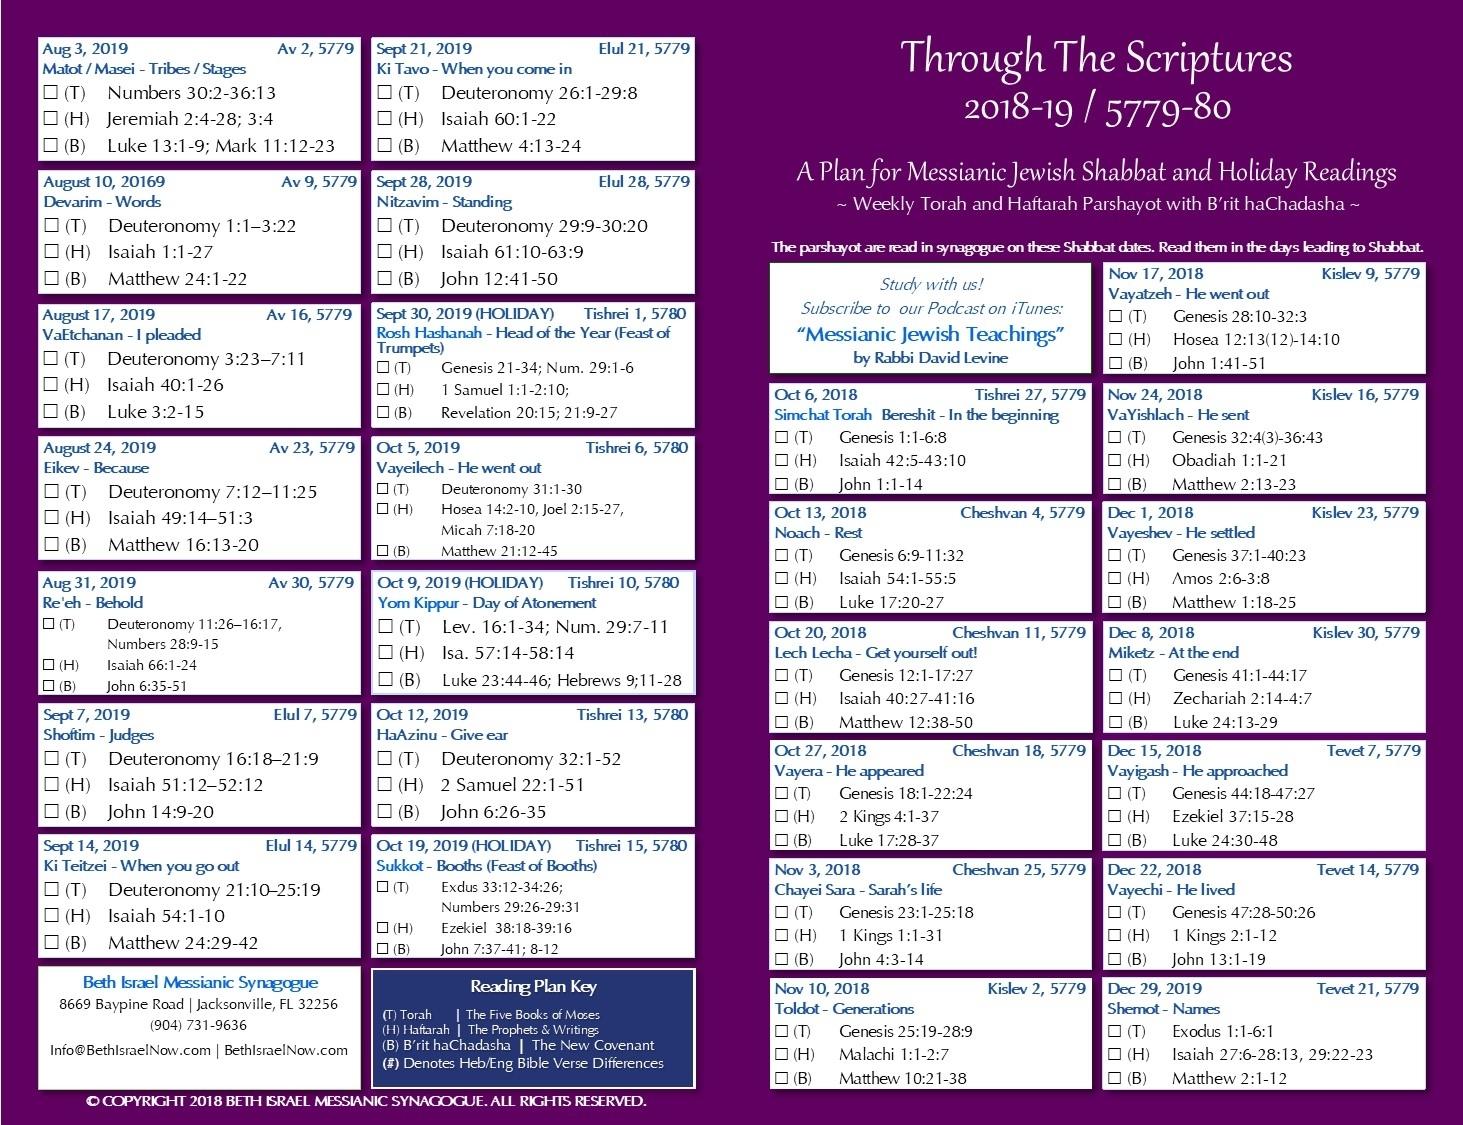 Bible Reading Plan | Bethisraelnow within Weekly Torah Parsha Calendar For 2019/2020